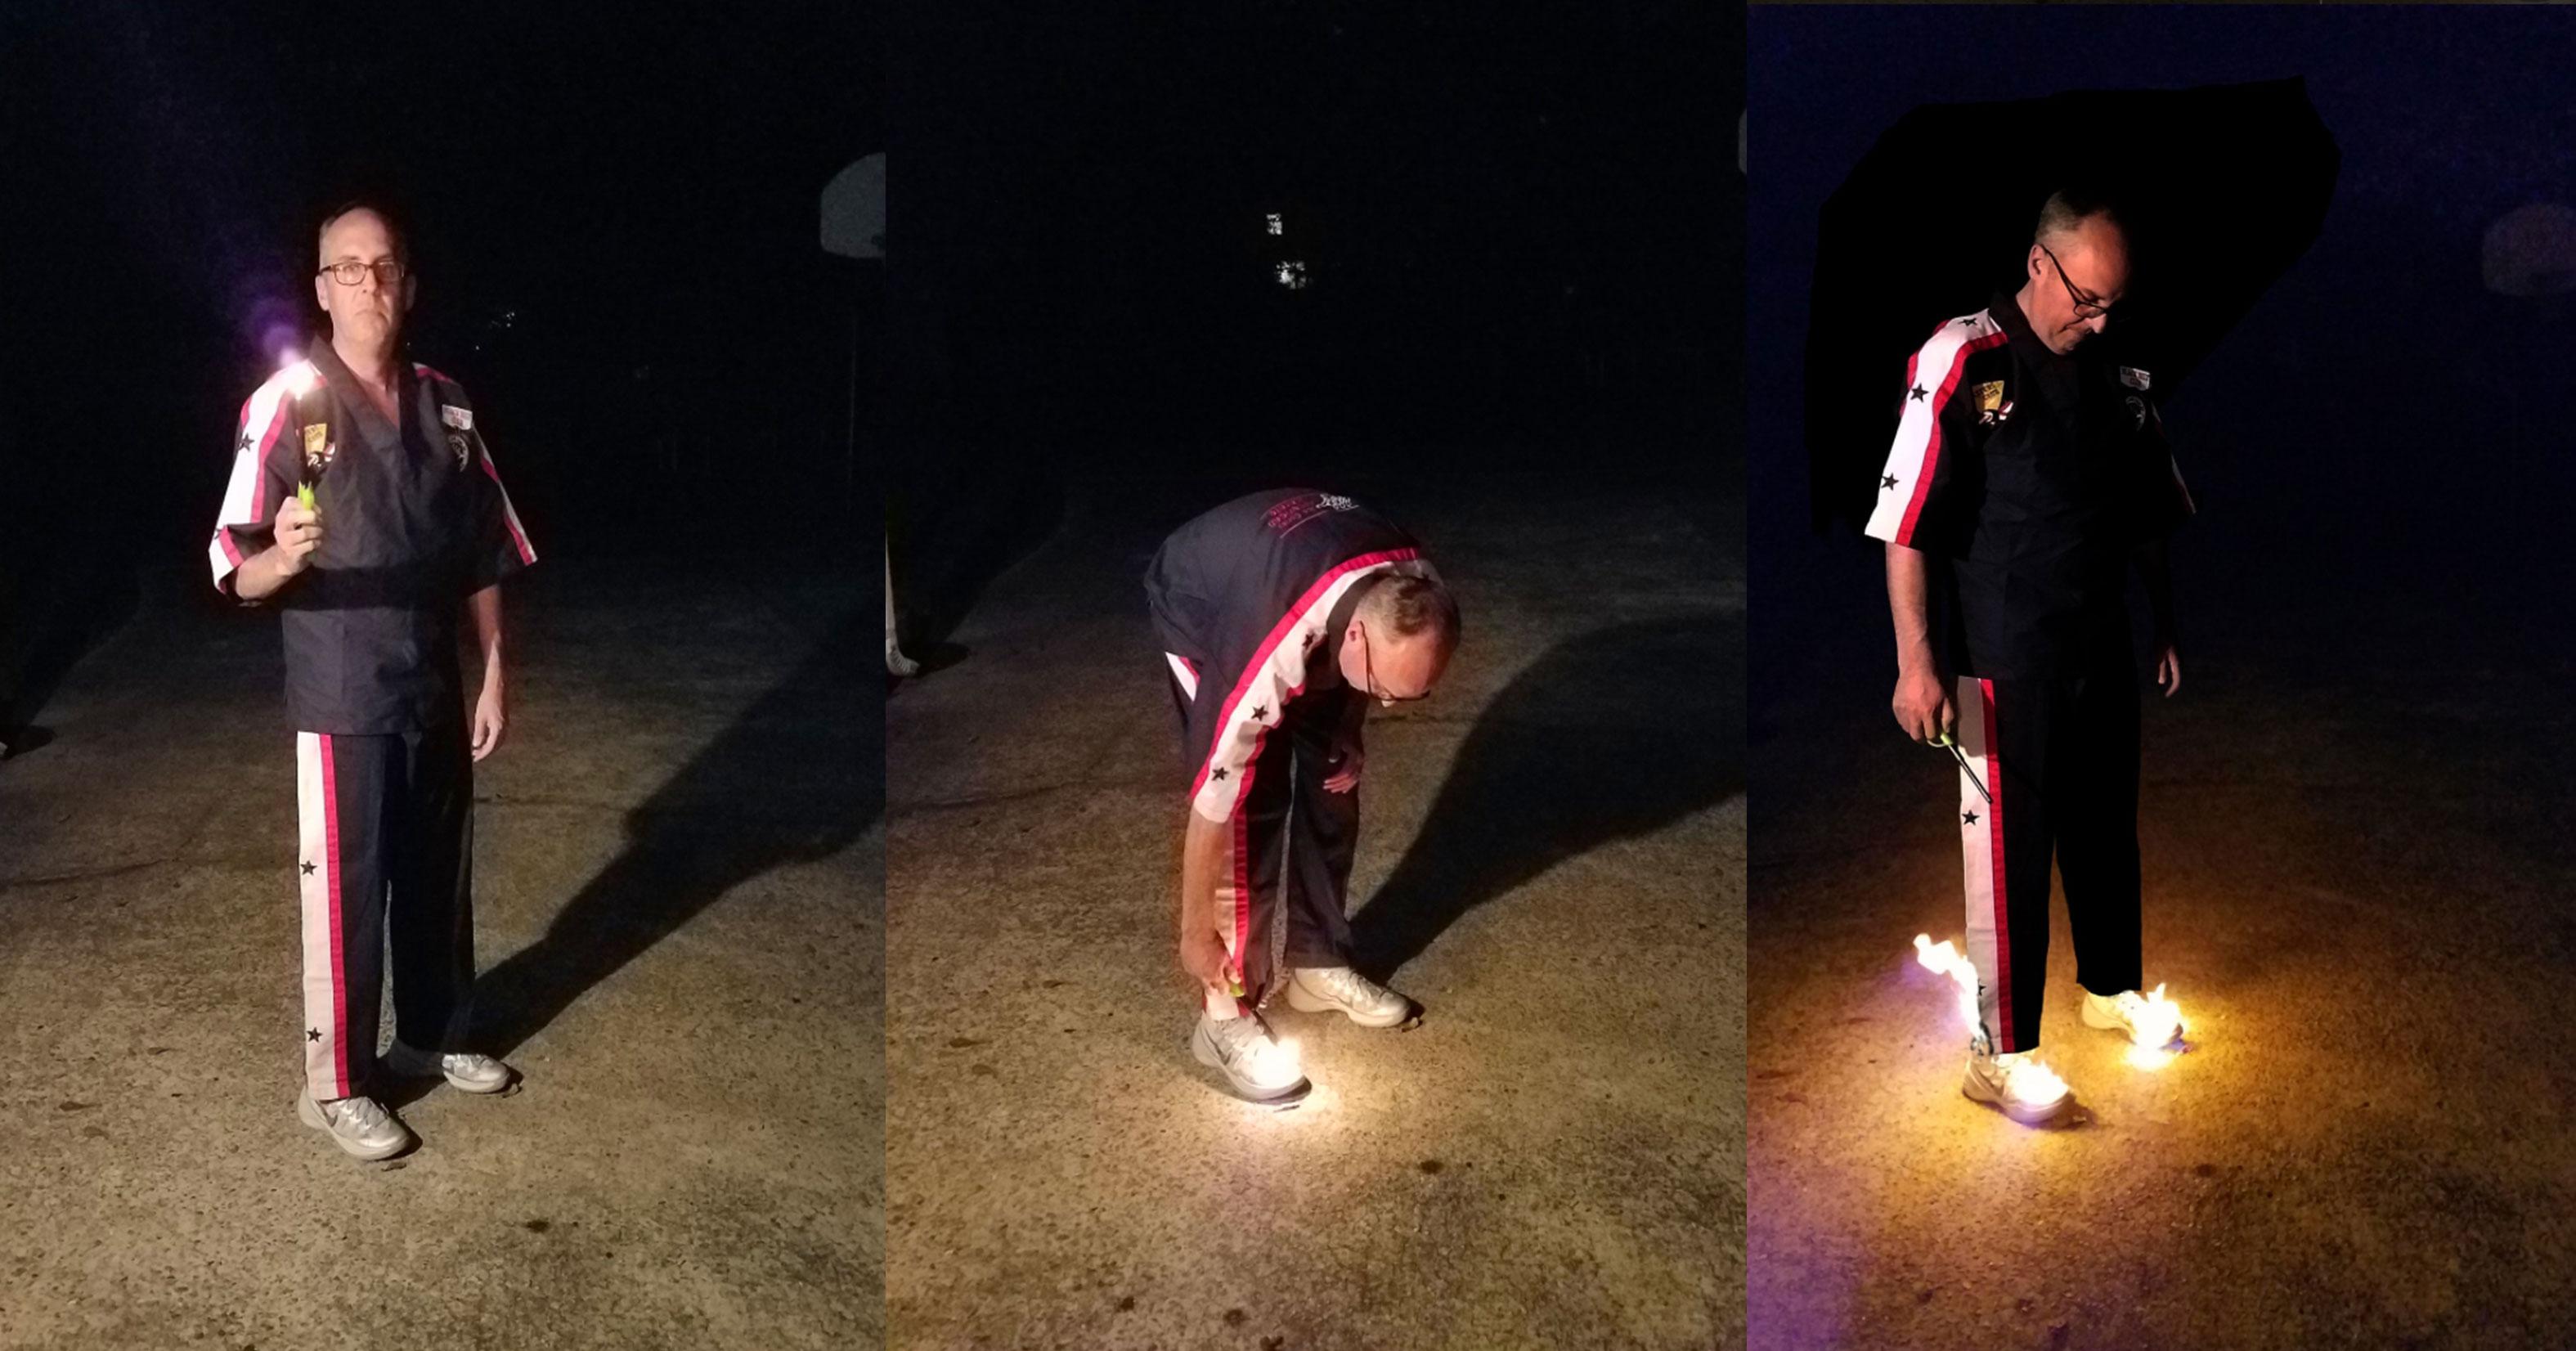 Man Burns His Nike Shoes While Wearing